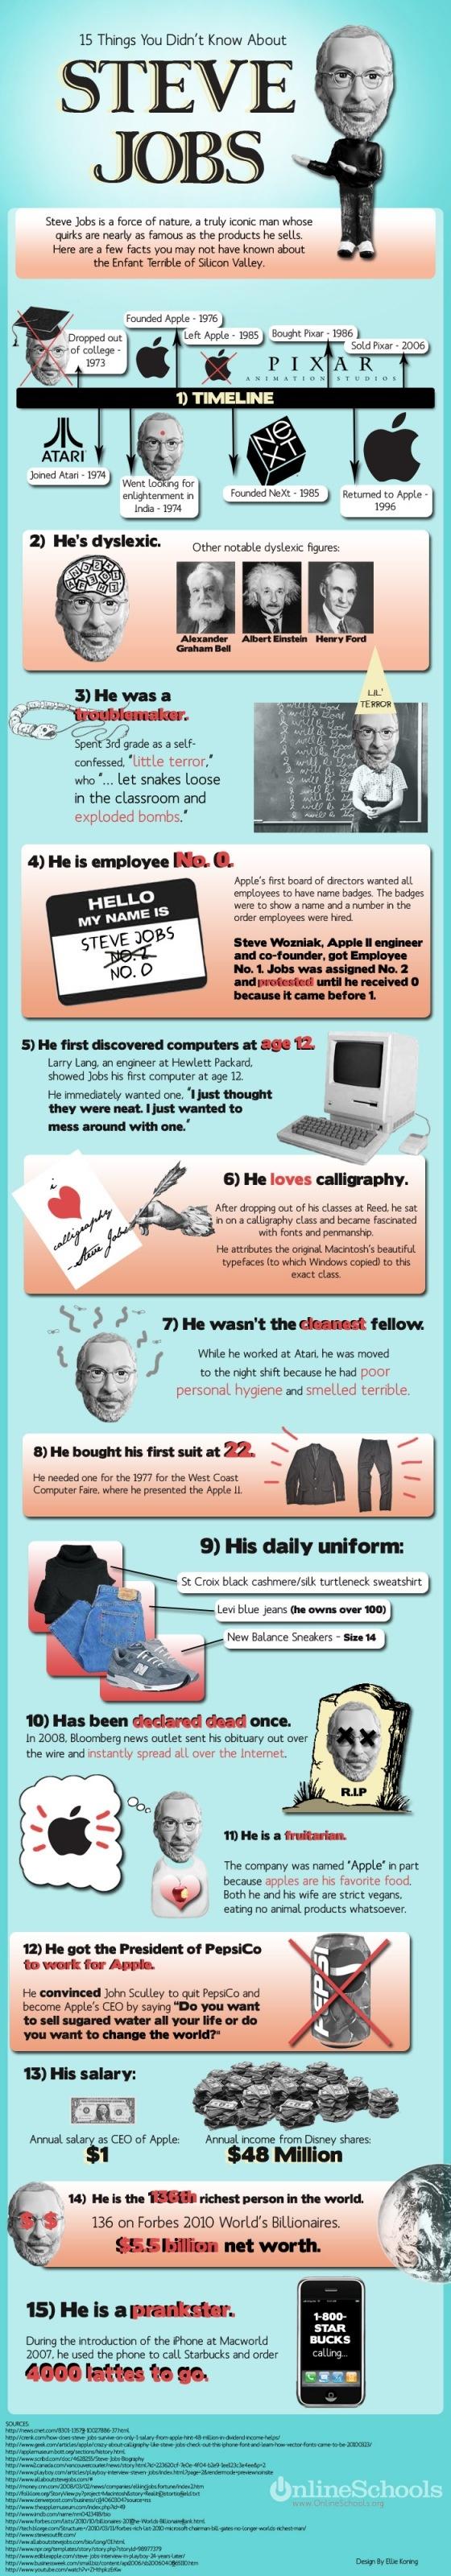 15 Curiosidades sobre Steve Jobs [infográfico]